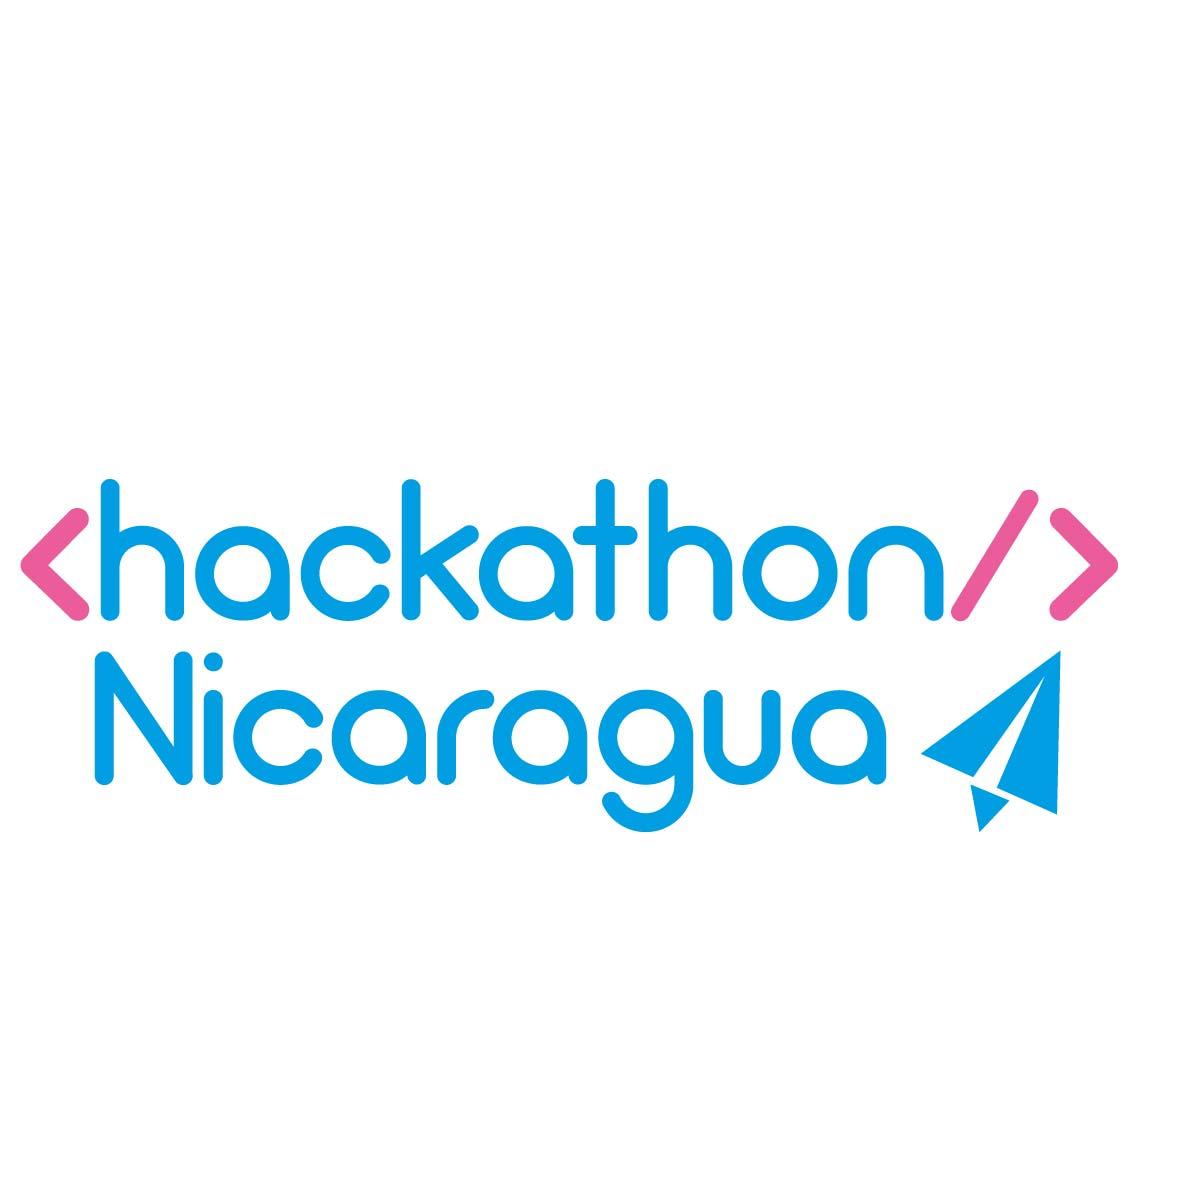 Hackathon Nicaaragua